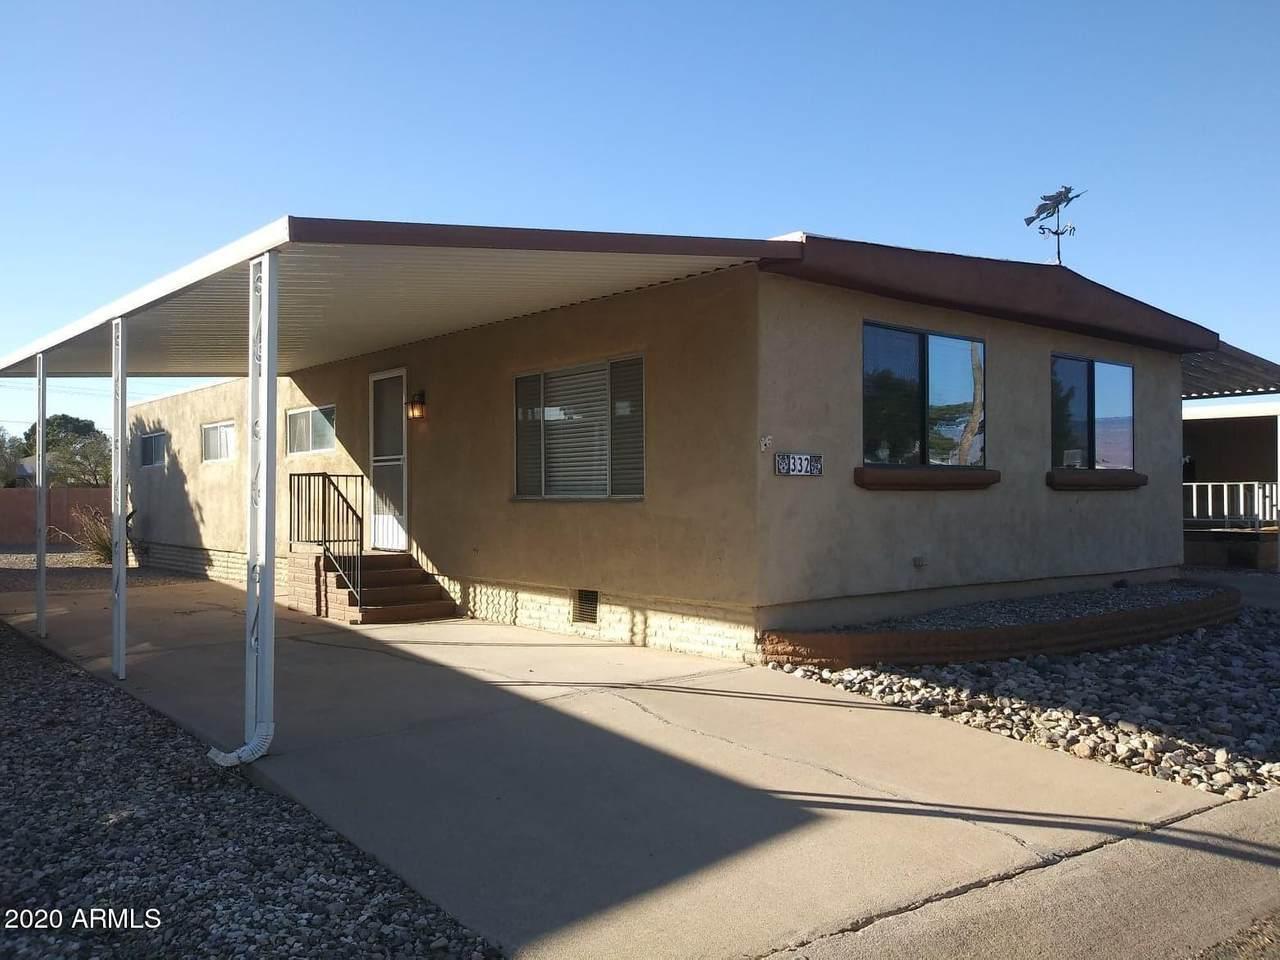 3411 Camino Seco Road - Photo 1